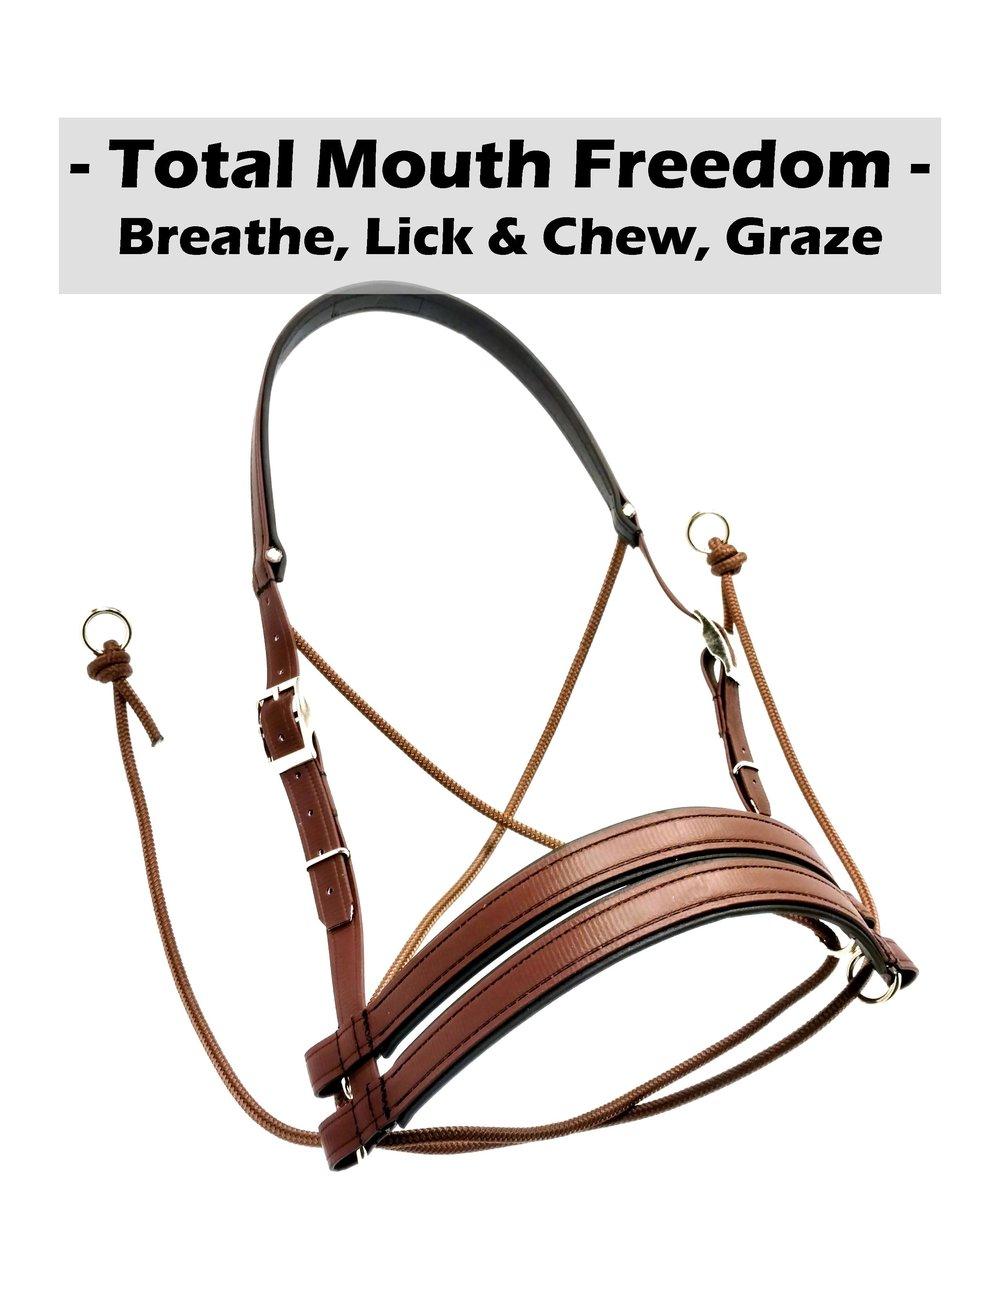 Mouth Freedom.jpg